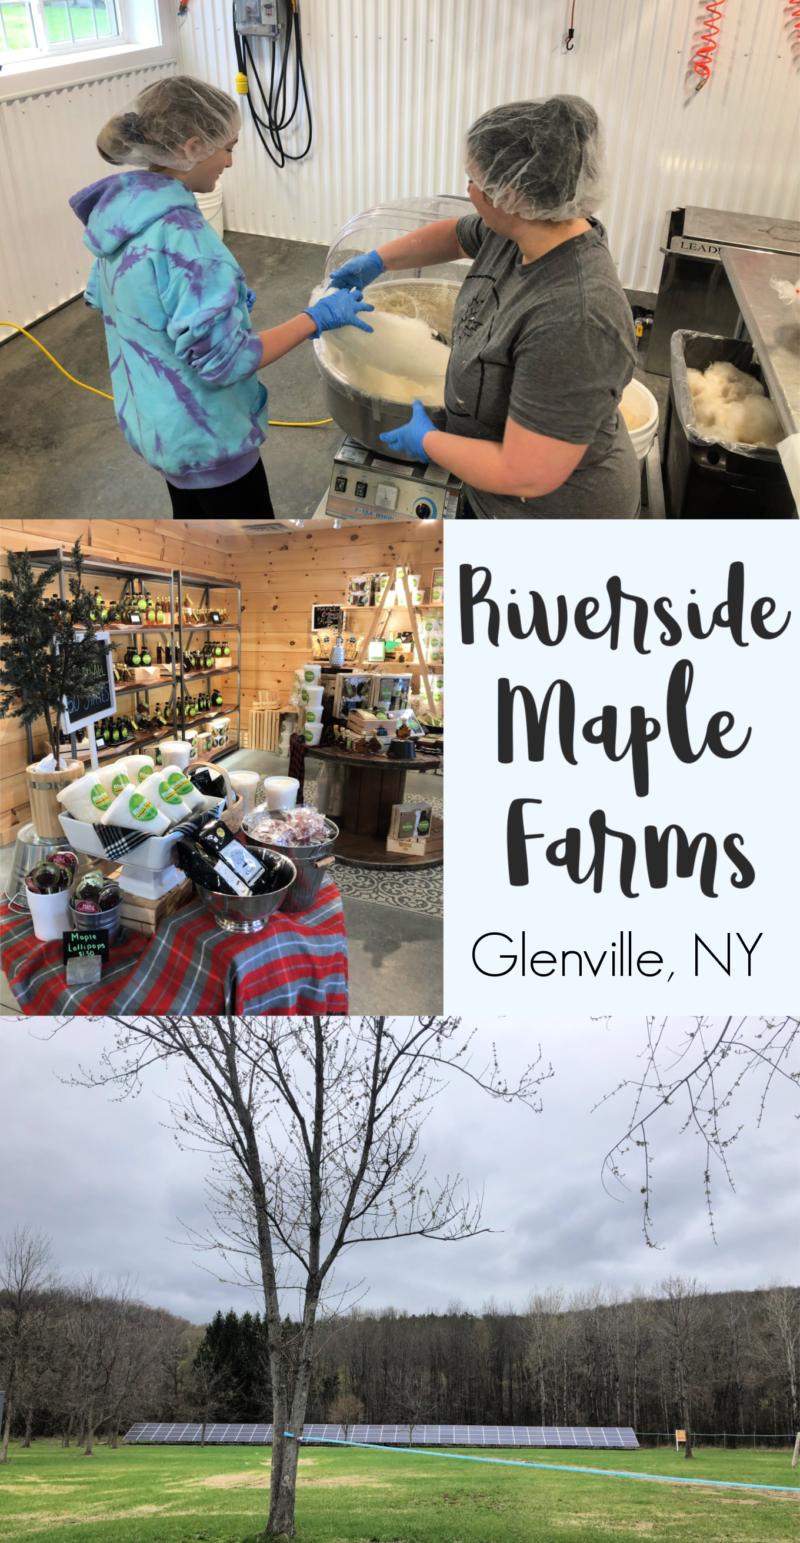 Riverside Maple Farms, Glenville NY